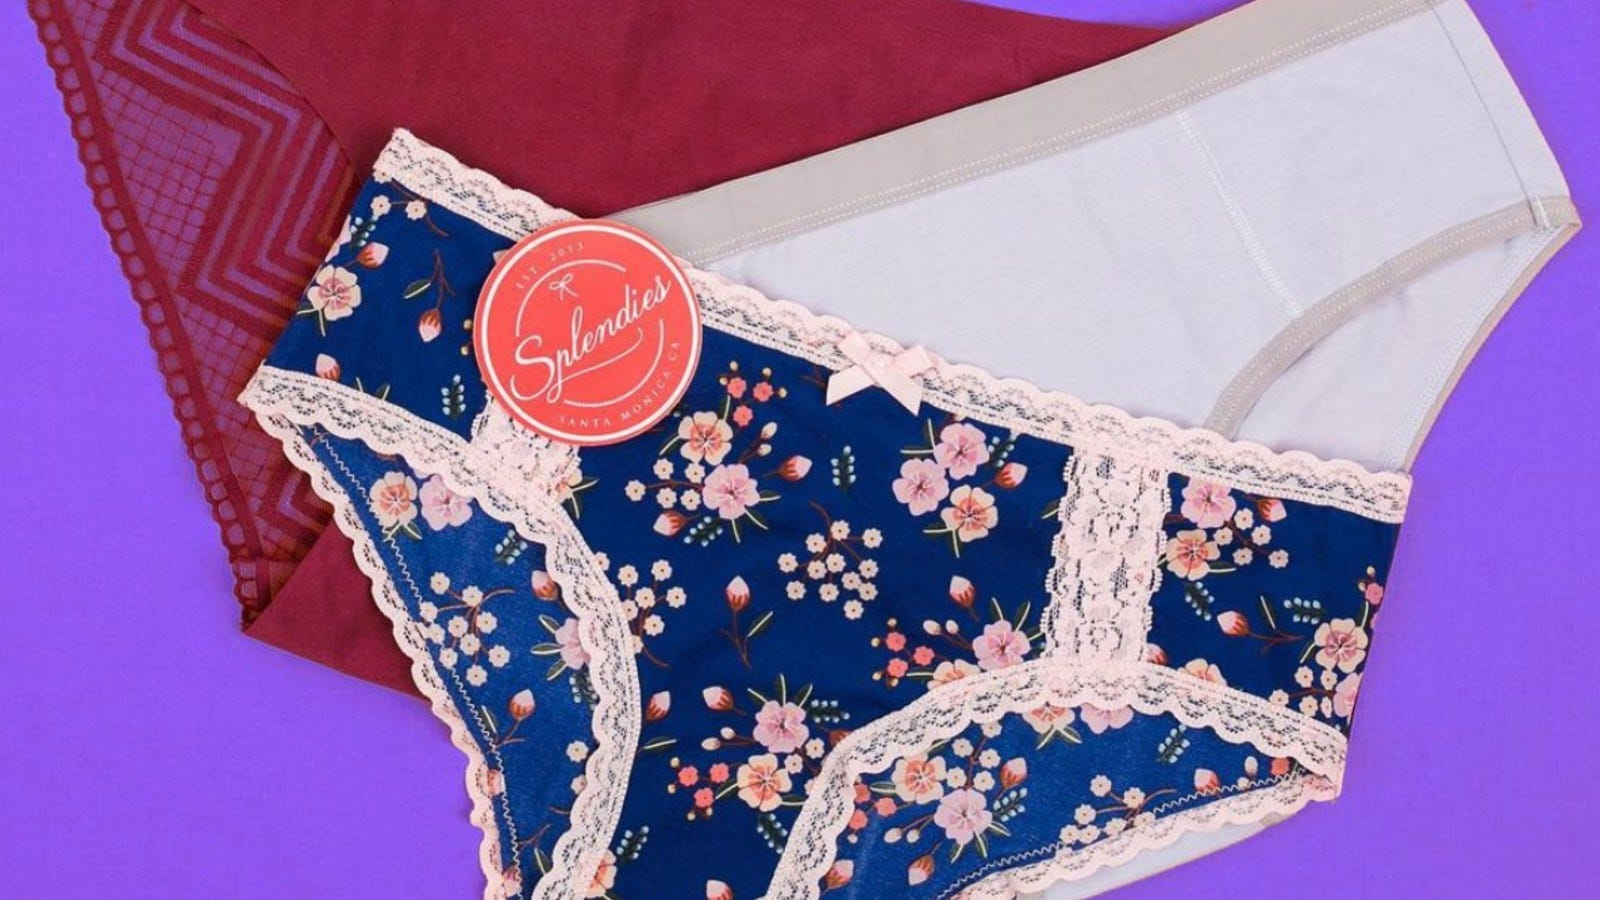 Three pairs of Splendies underwear.